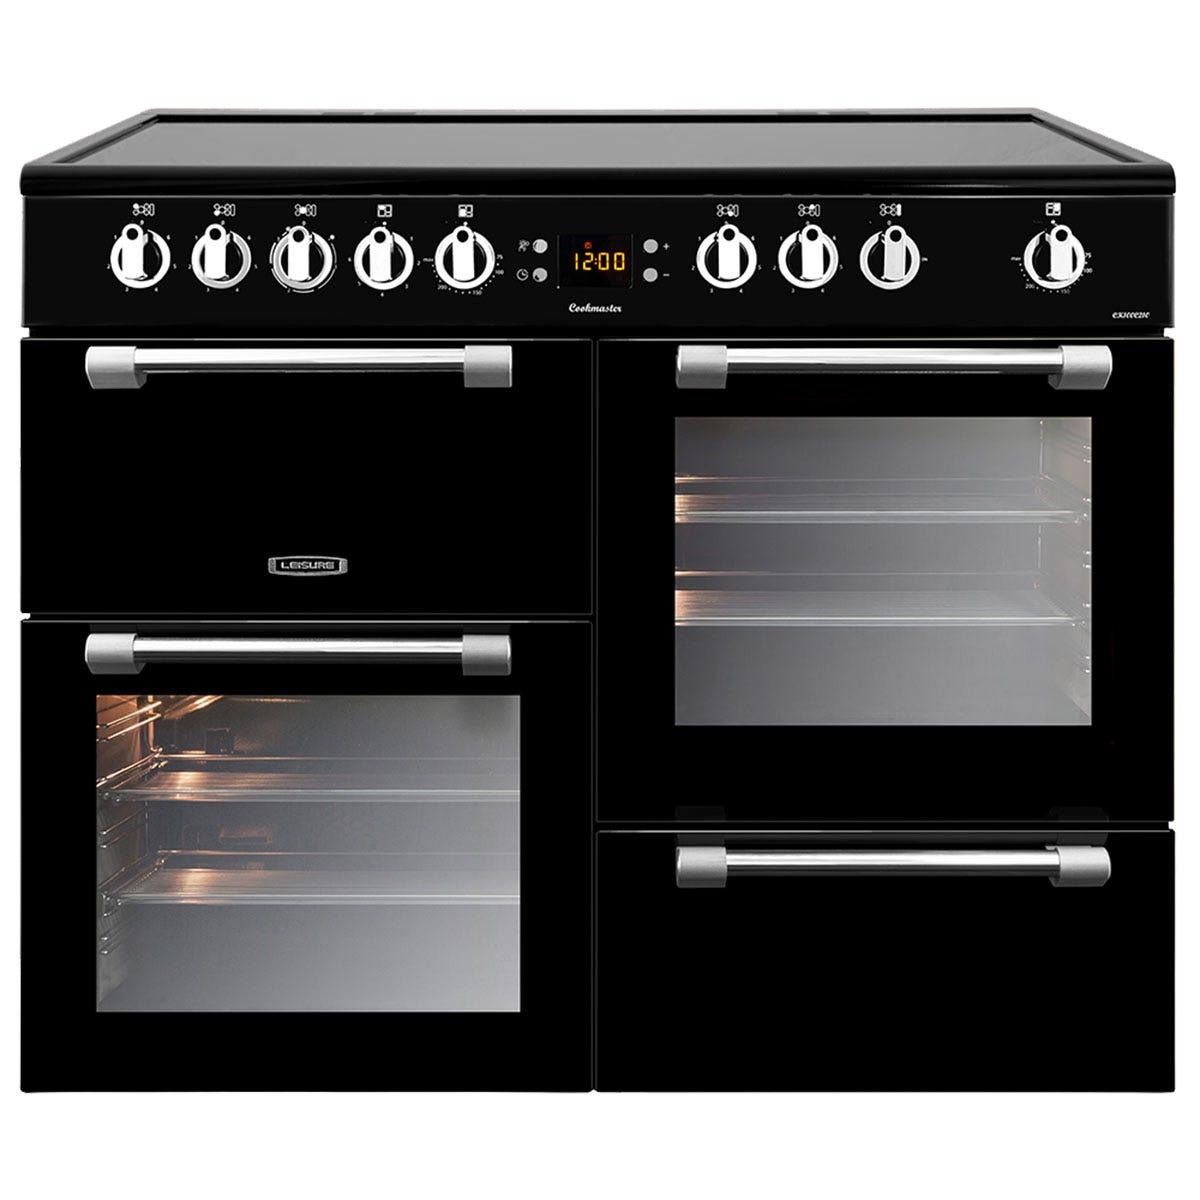 Leisure CK100C210K 100cm Cookmaster Electric Range Cooker - Black